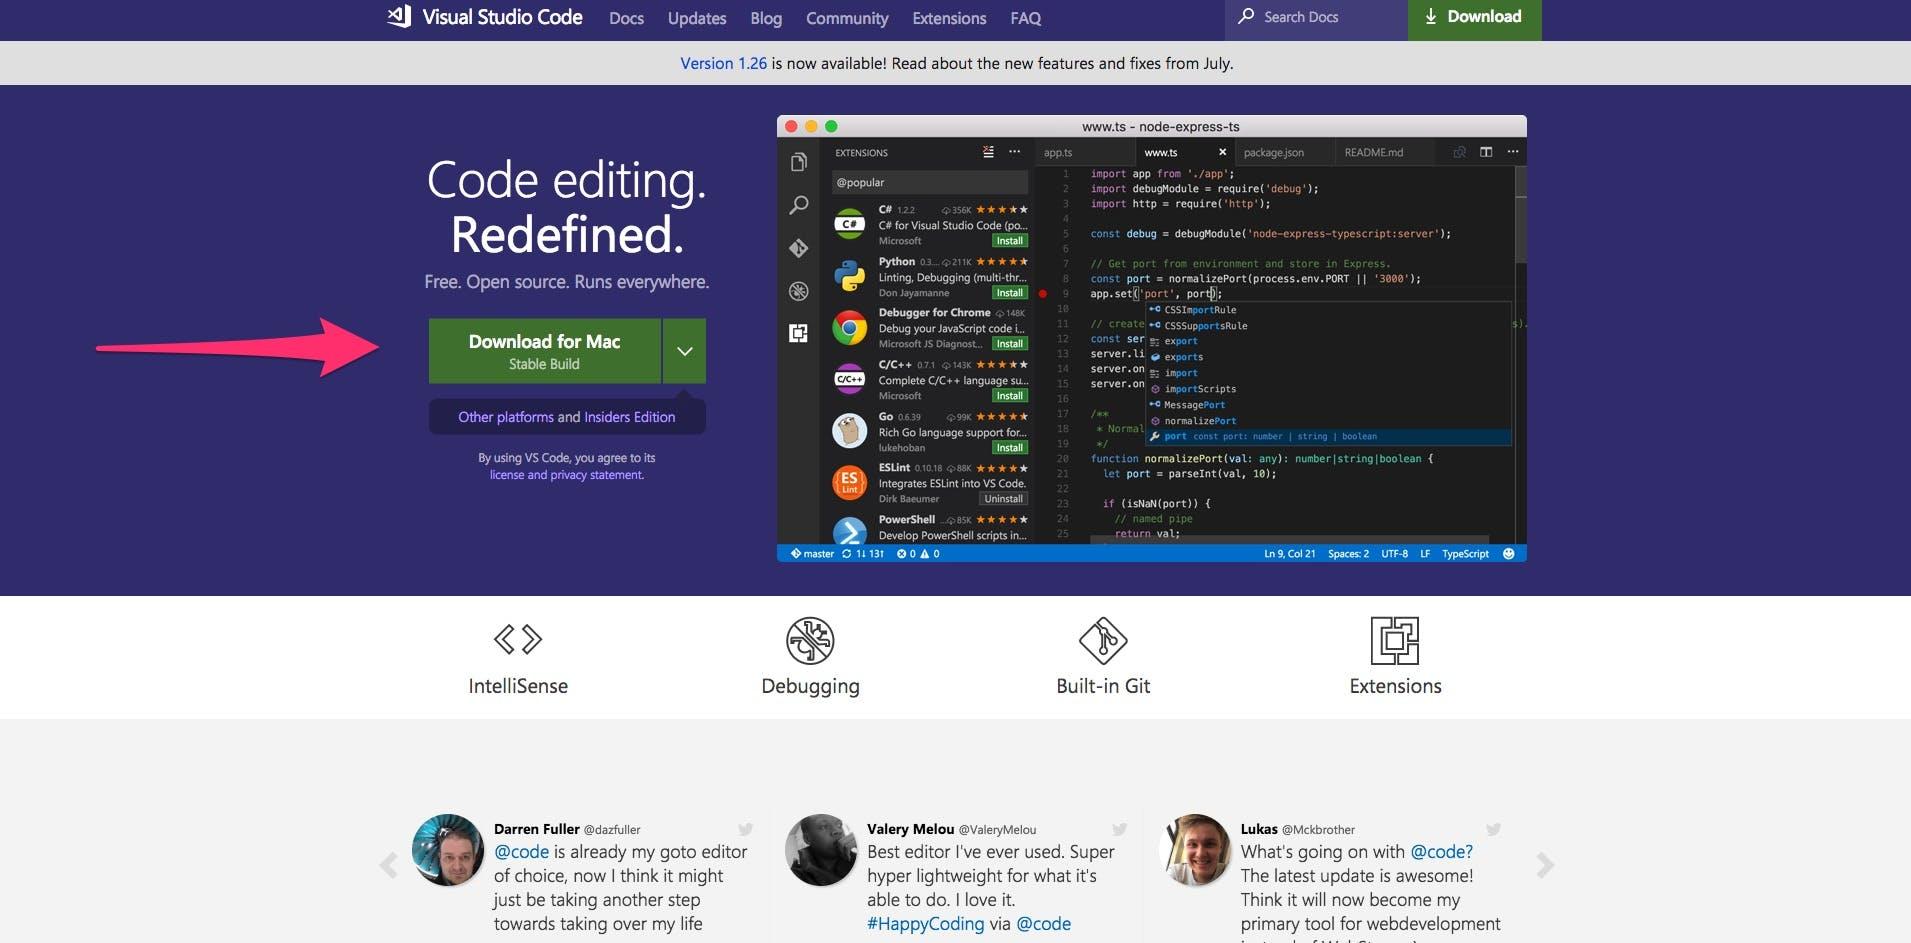 Visual_Studio_Code_-_Code_Editing__Redefined.jpg